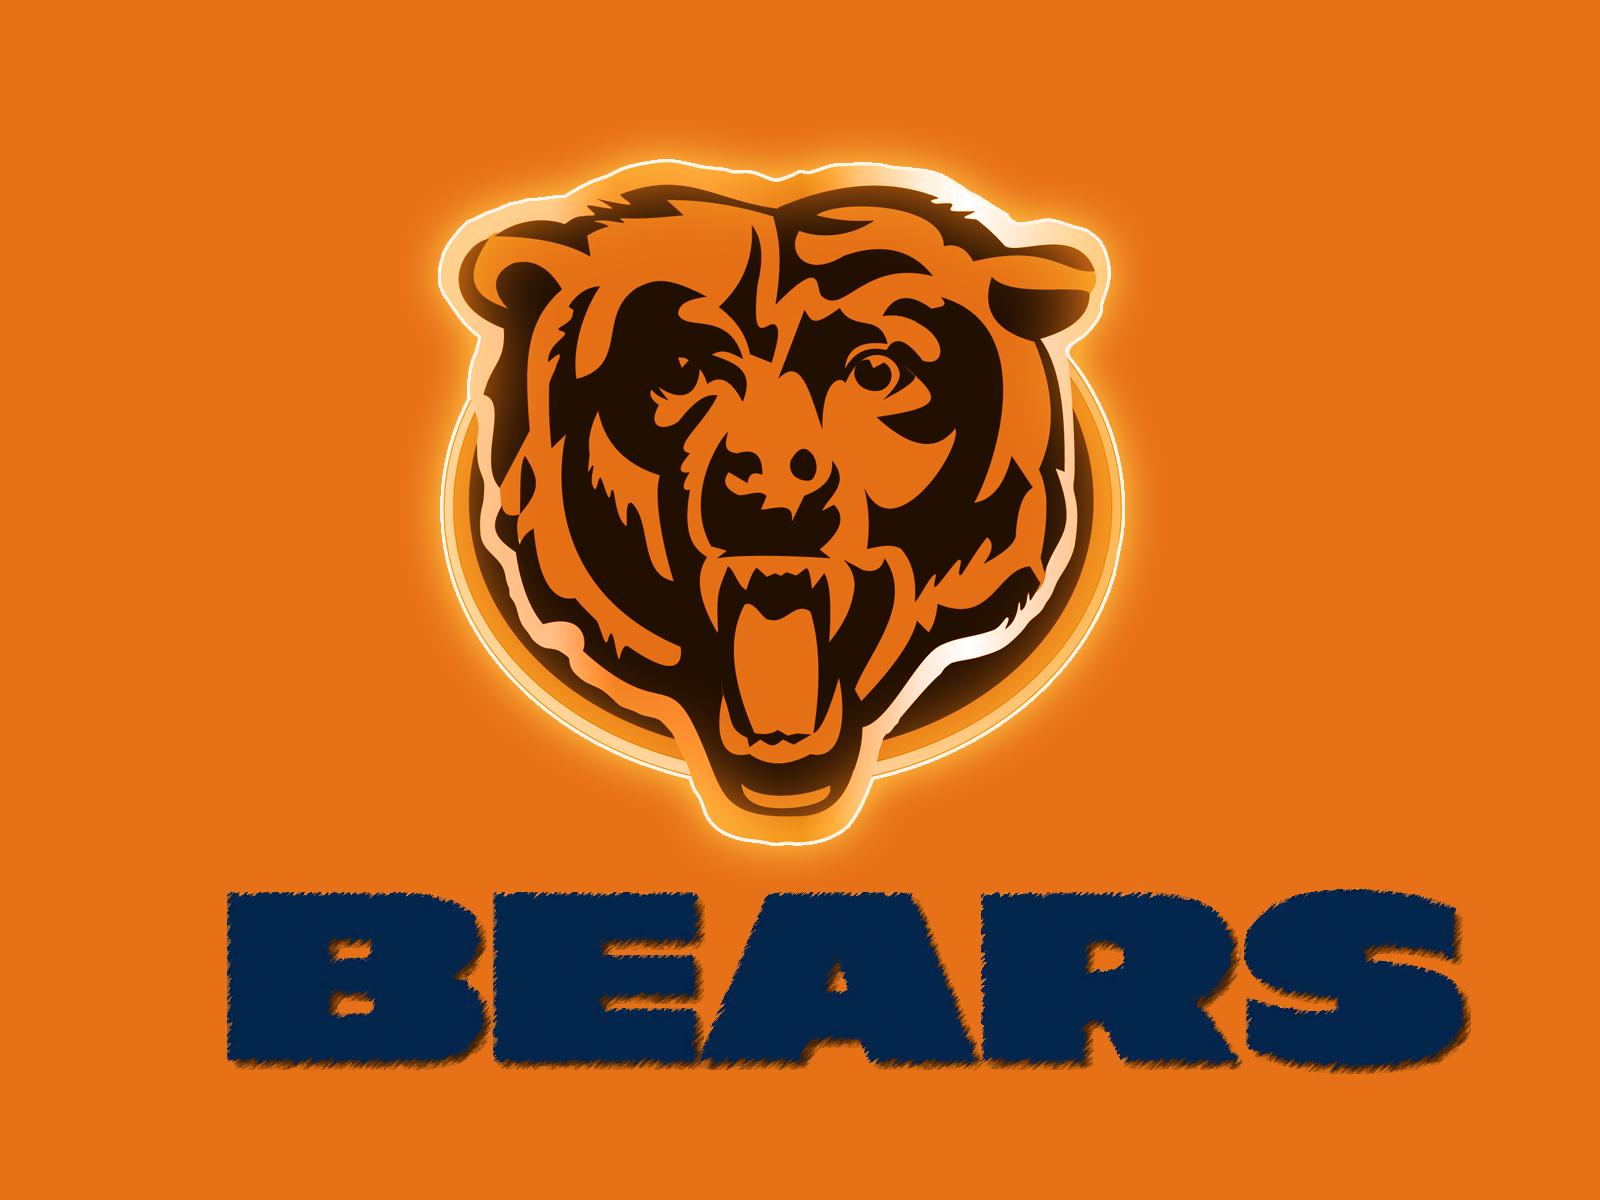 Chicago Bears wallpaper desktop image Chicago Bears wallpapers 1600x1200